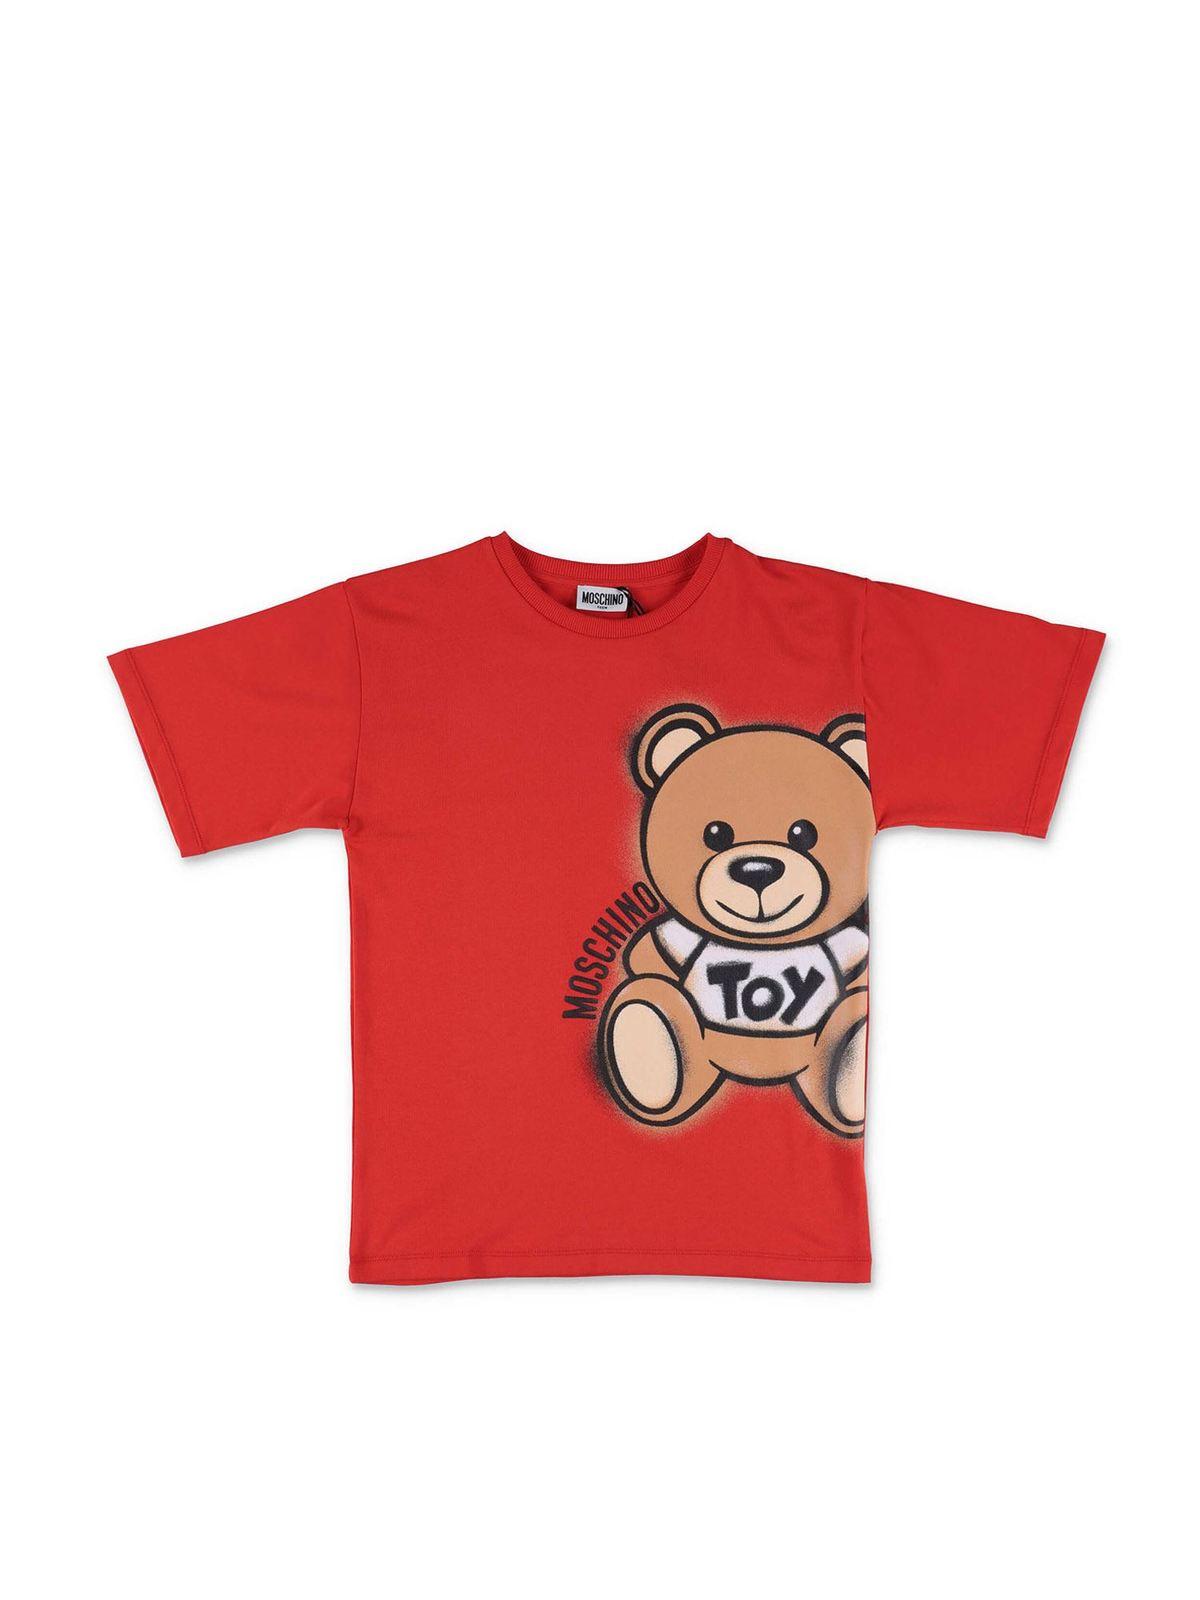 MOSCHINO SPRAY TEDDY BEAR MAXI T-SHIRT IN RED